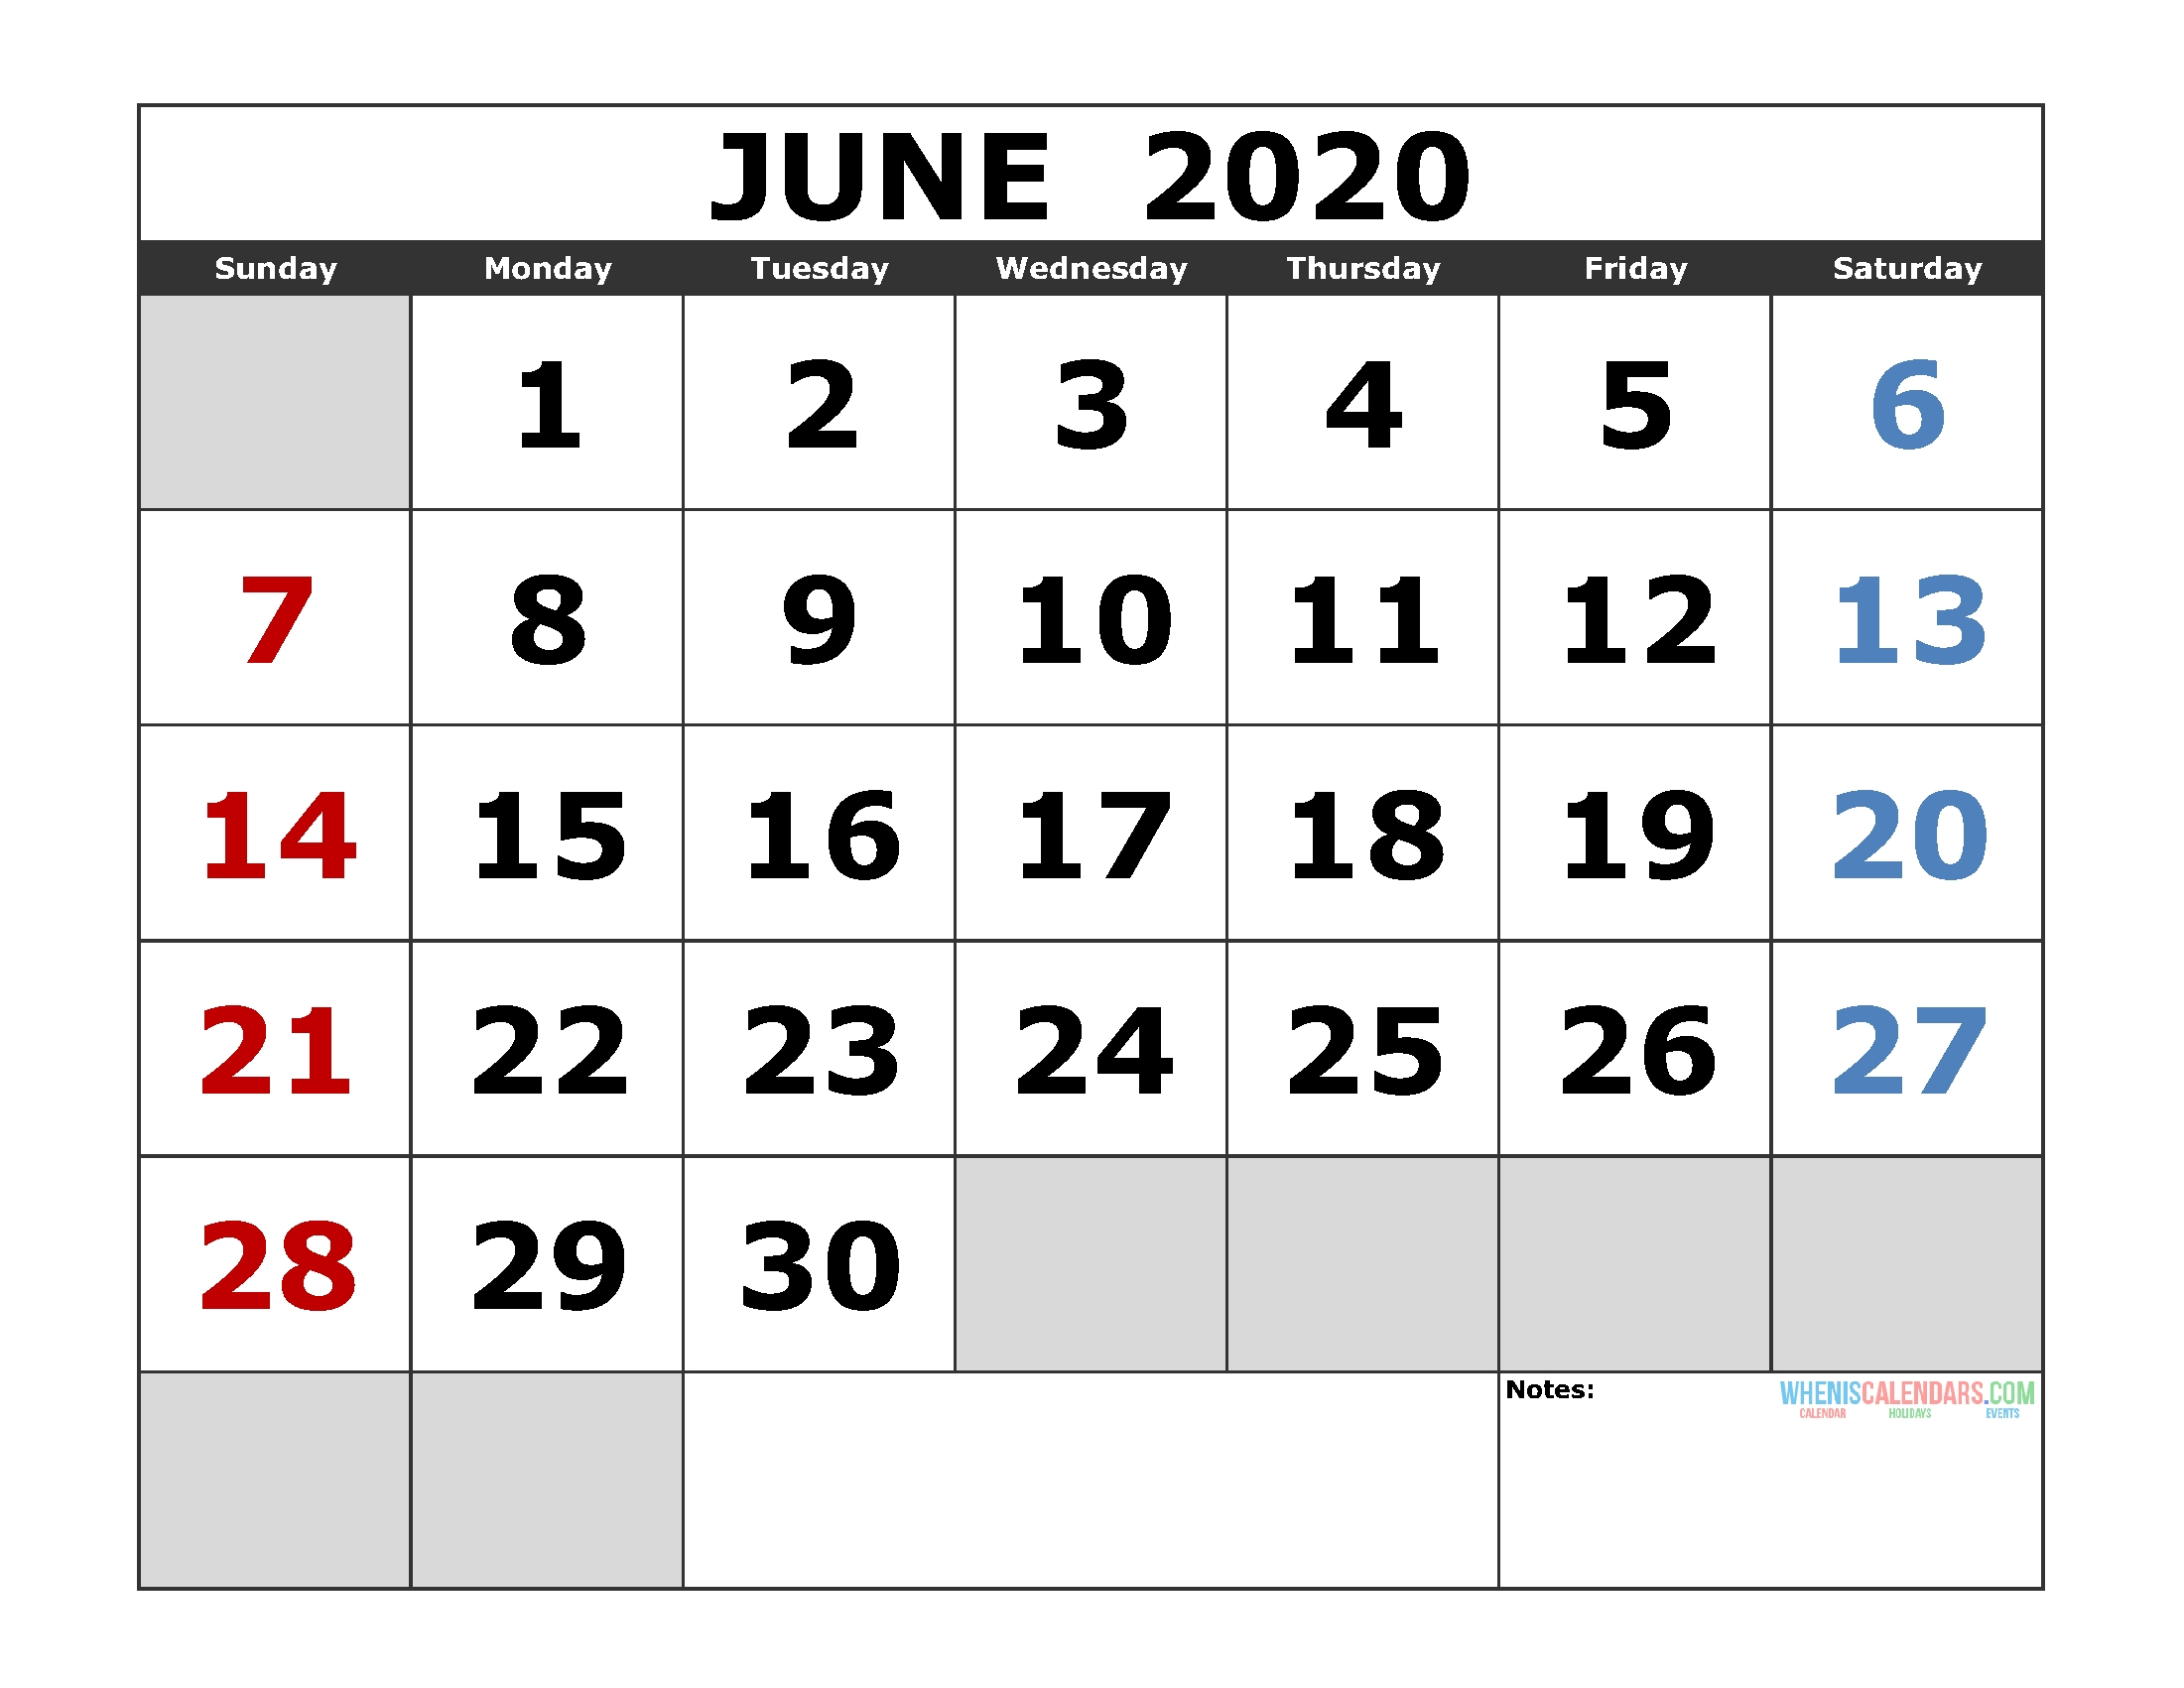 June 2020 Printable Calendar Template Excel, Pdf, Image [Us-Monthly June 2020 Calendar